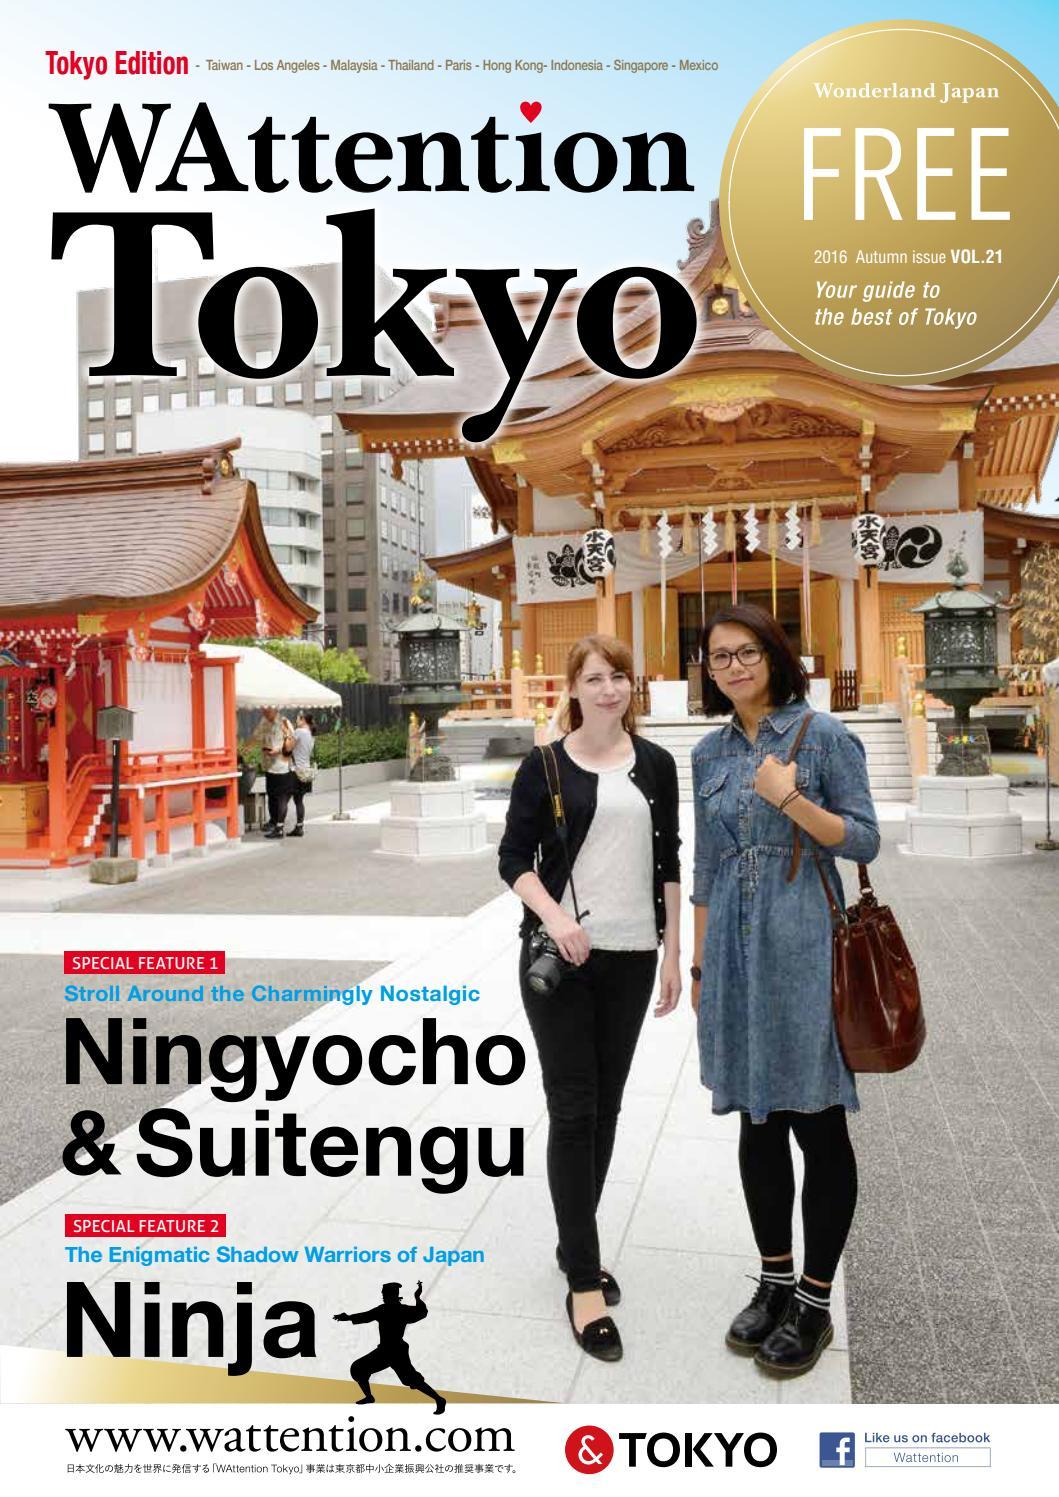 Wattention Tokyo Vol 21 By Wattention Issuu